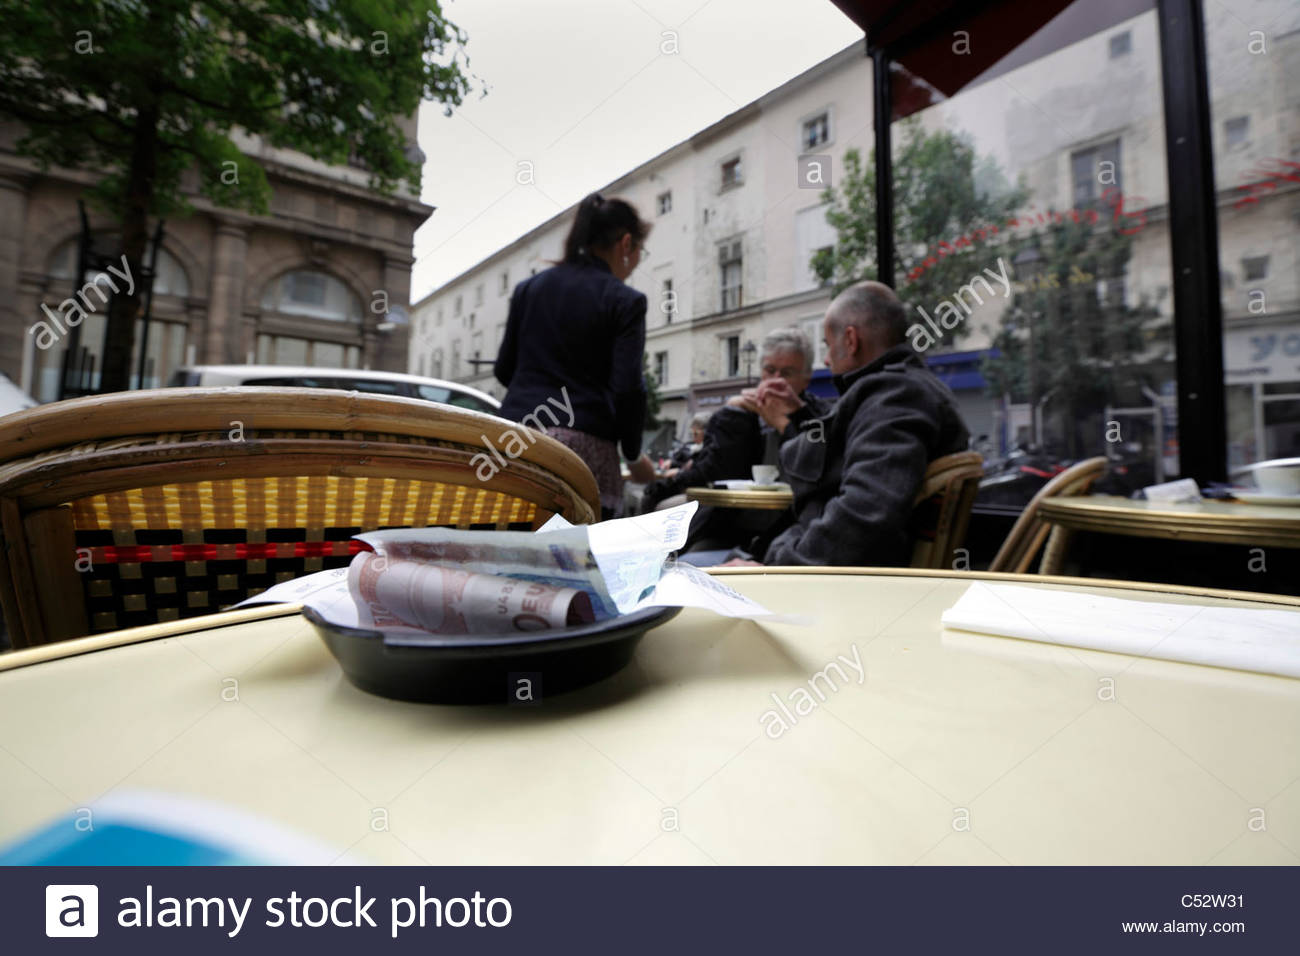 paris bistro waiter stockfotos paris bistro waiter bilder alamy. Black Bedroom Furniture Sets. Home Design Ideas